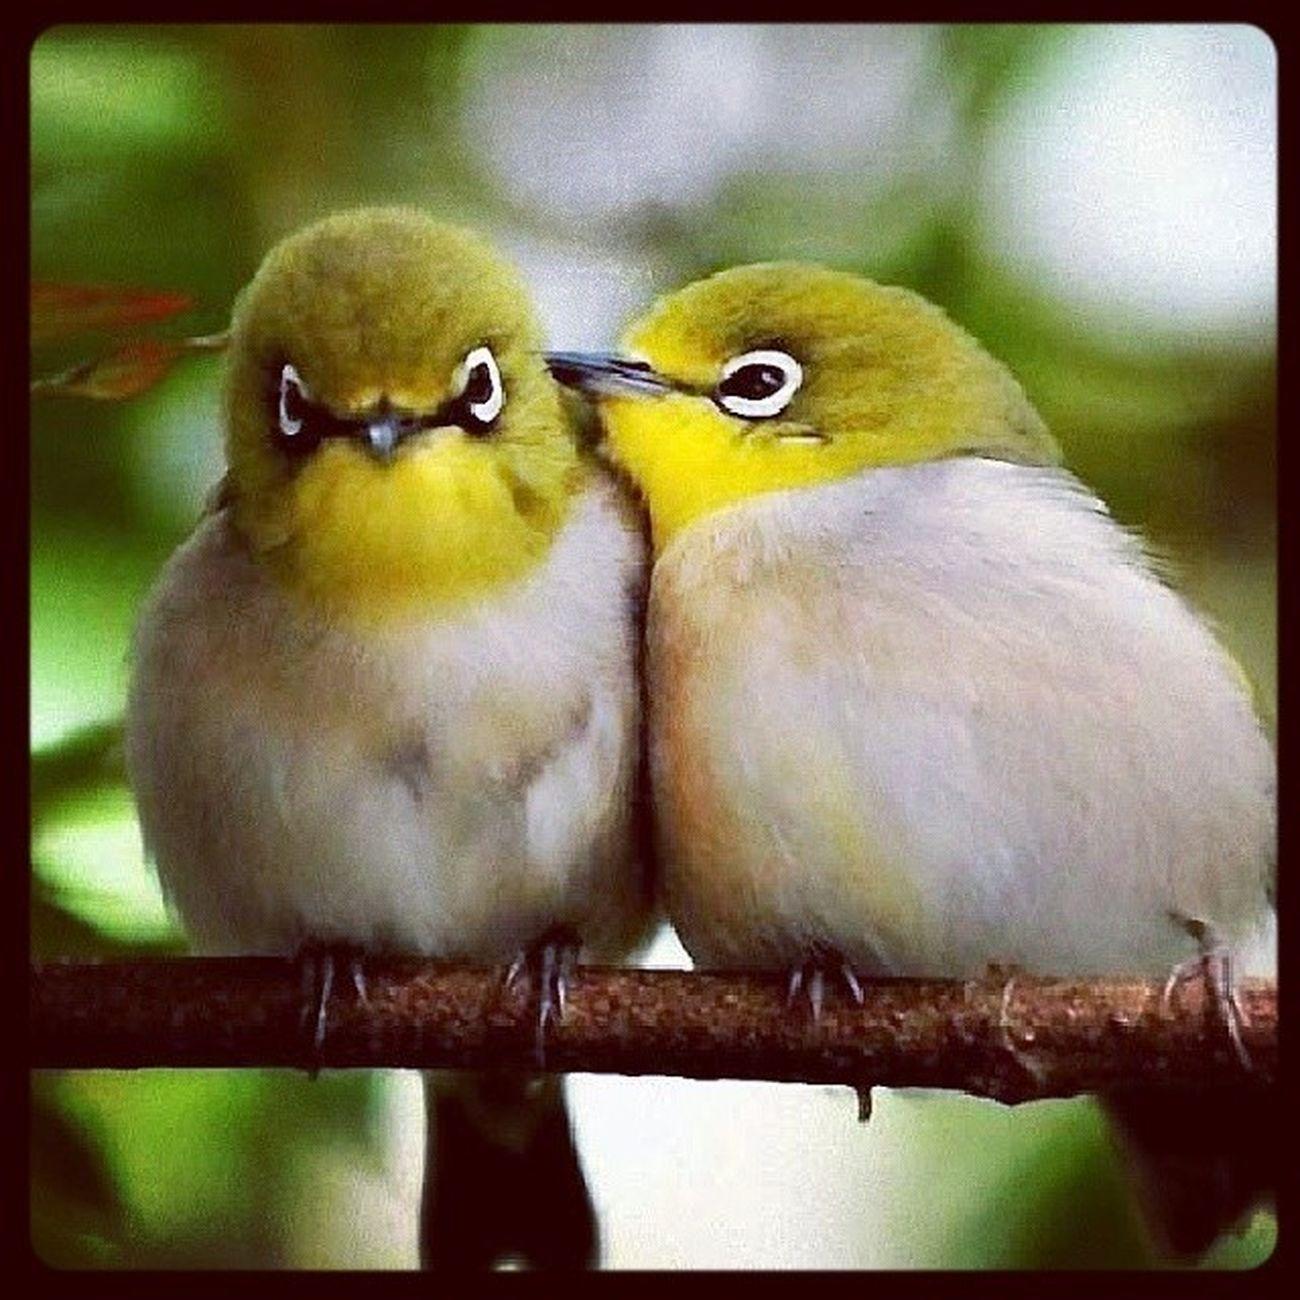 Bird Uccelli Occhialini Occhialinigiapponesi natura bacio Kiss amore love nature